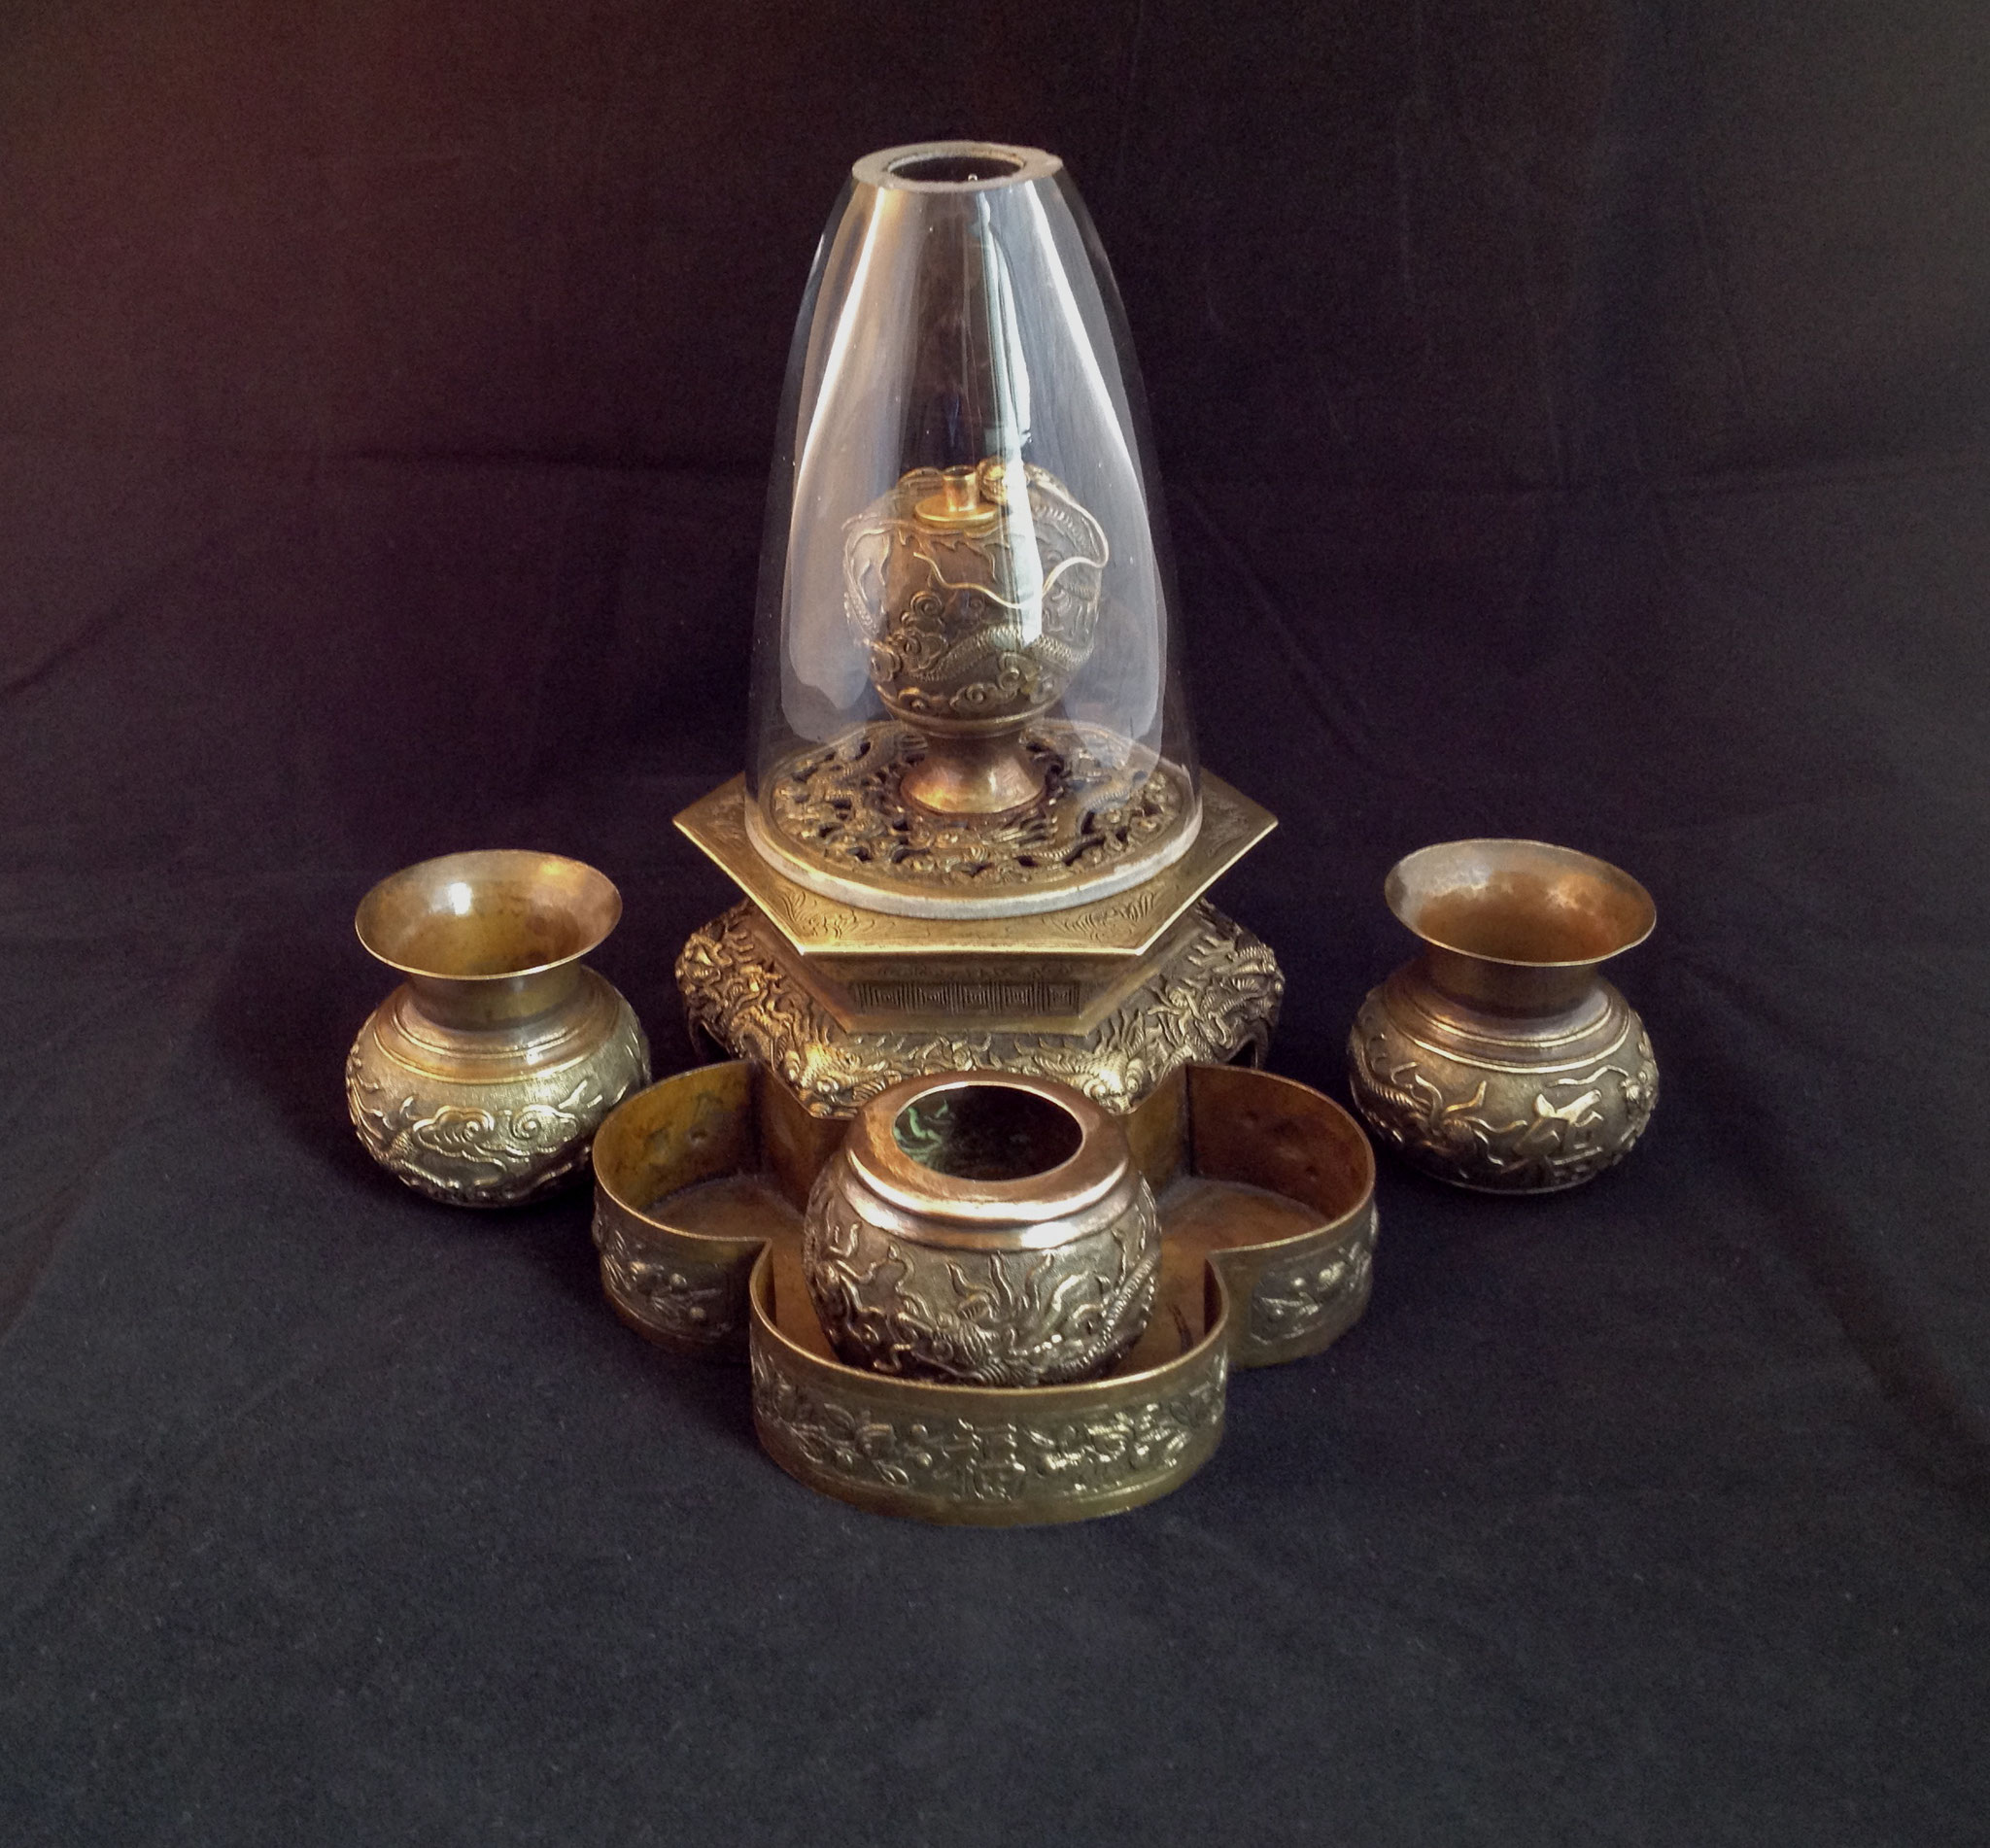 Opium smoker's set  (–> Accessoires)